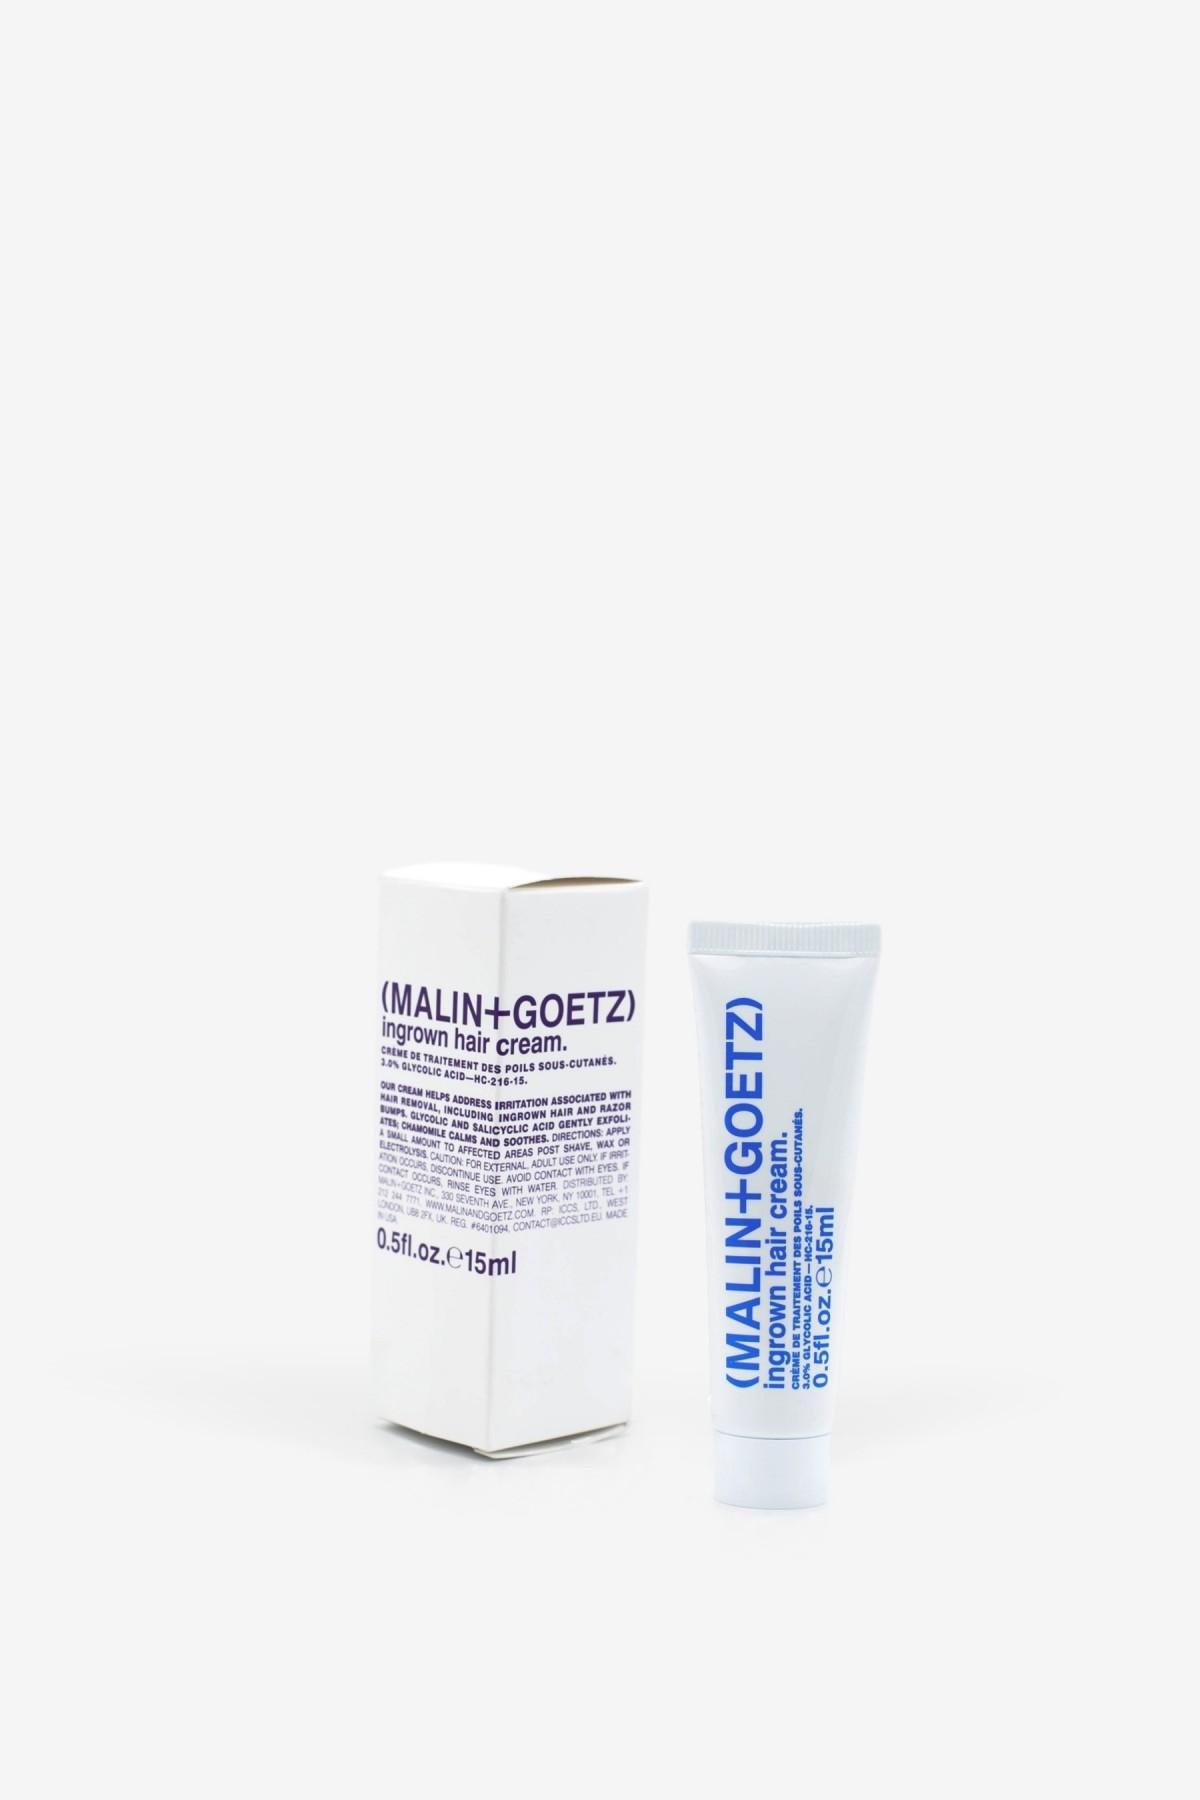 Malin+Goetz Ingrown Hair Cream 15g in